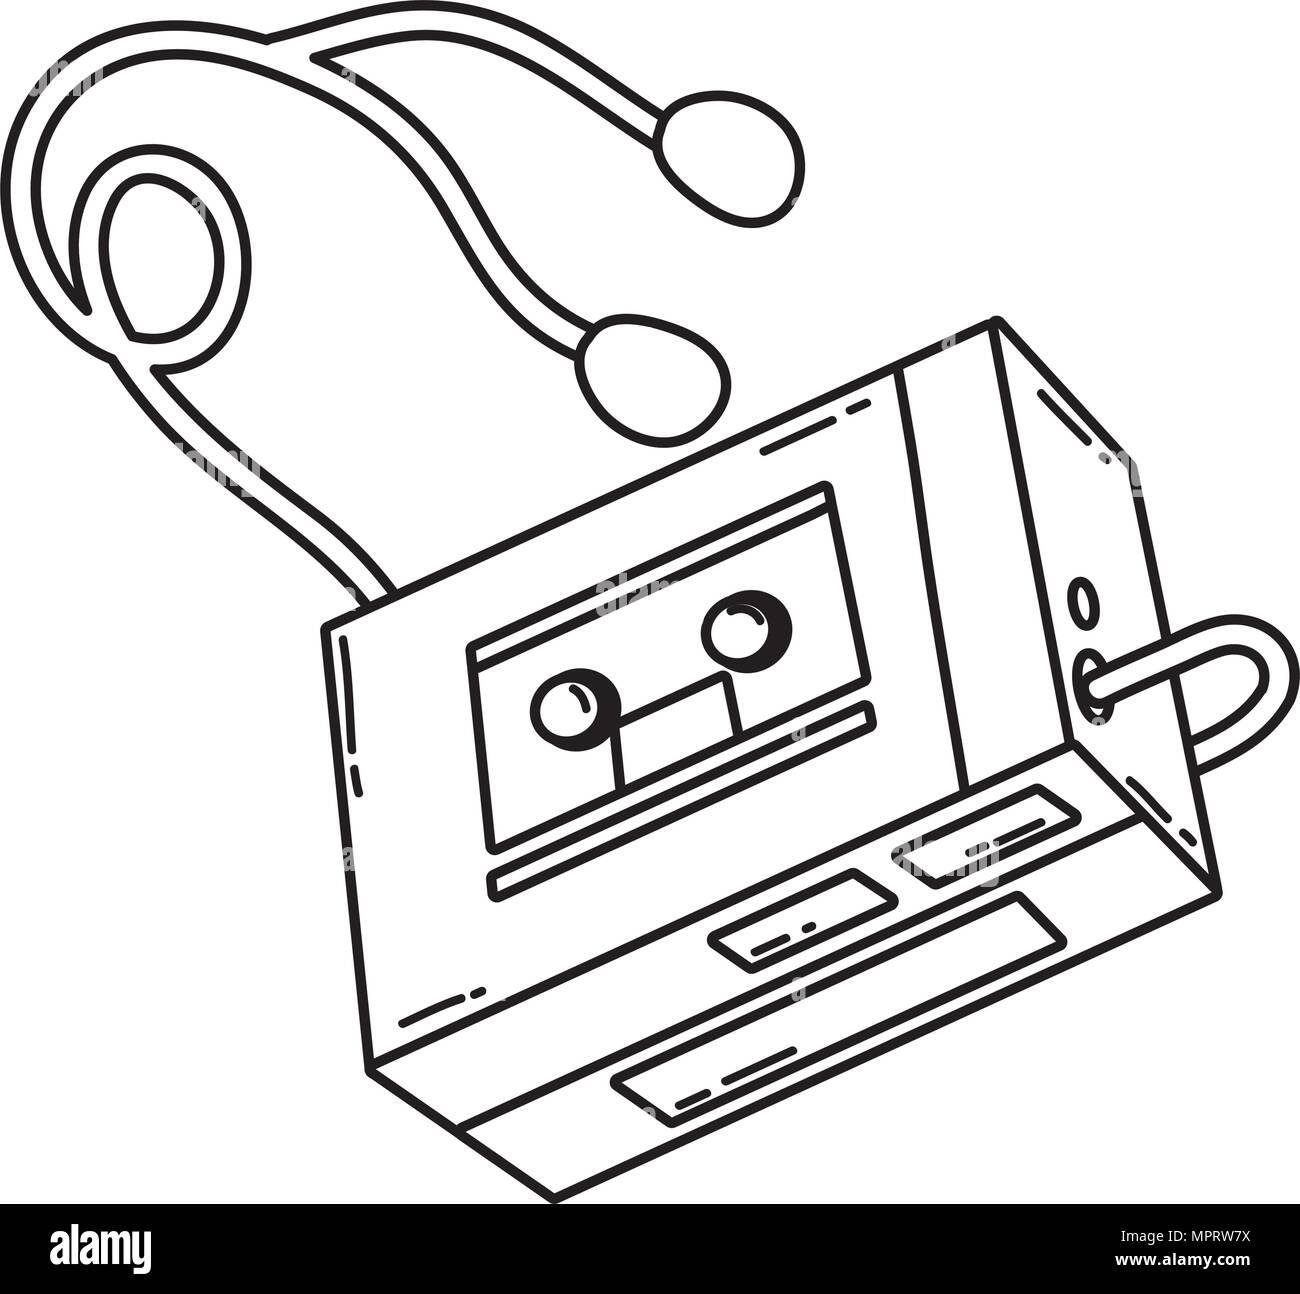 line retro walman stereo music player - Stock Image